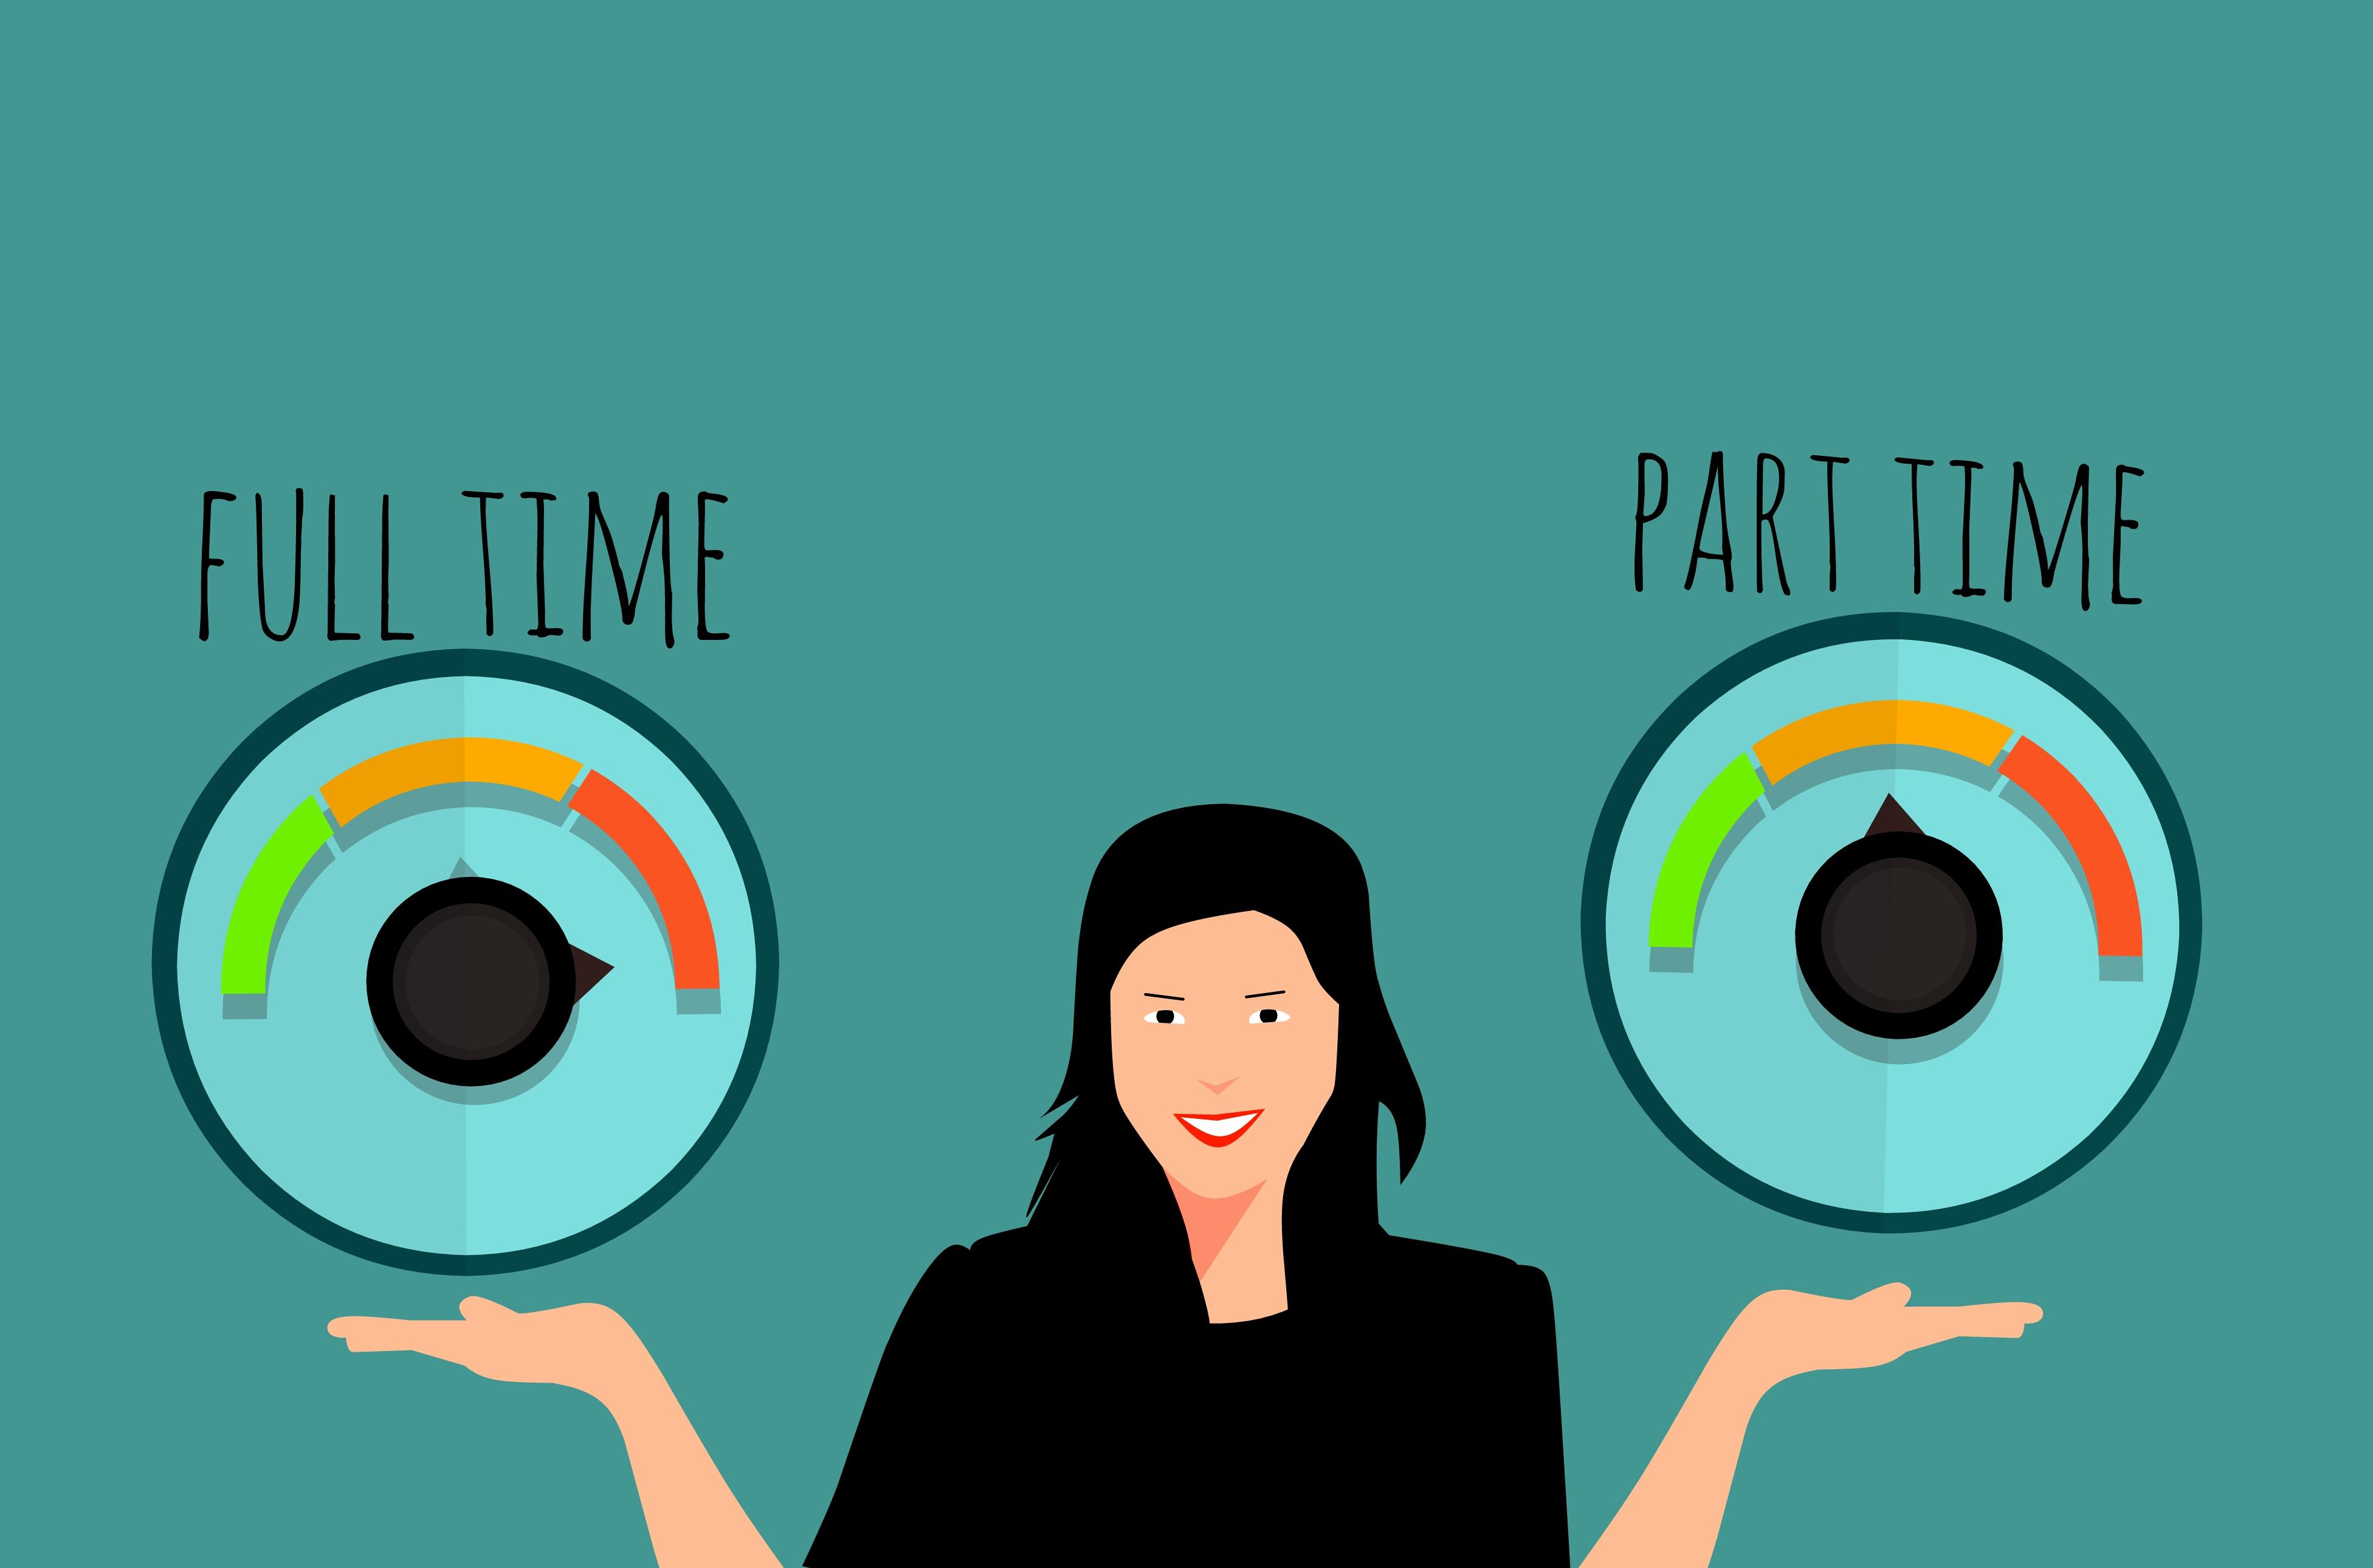 Free Images : part time job, full time job, advertisement